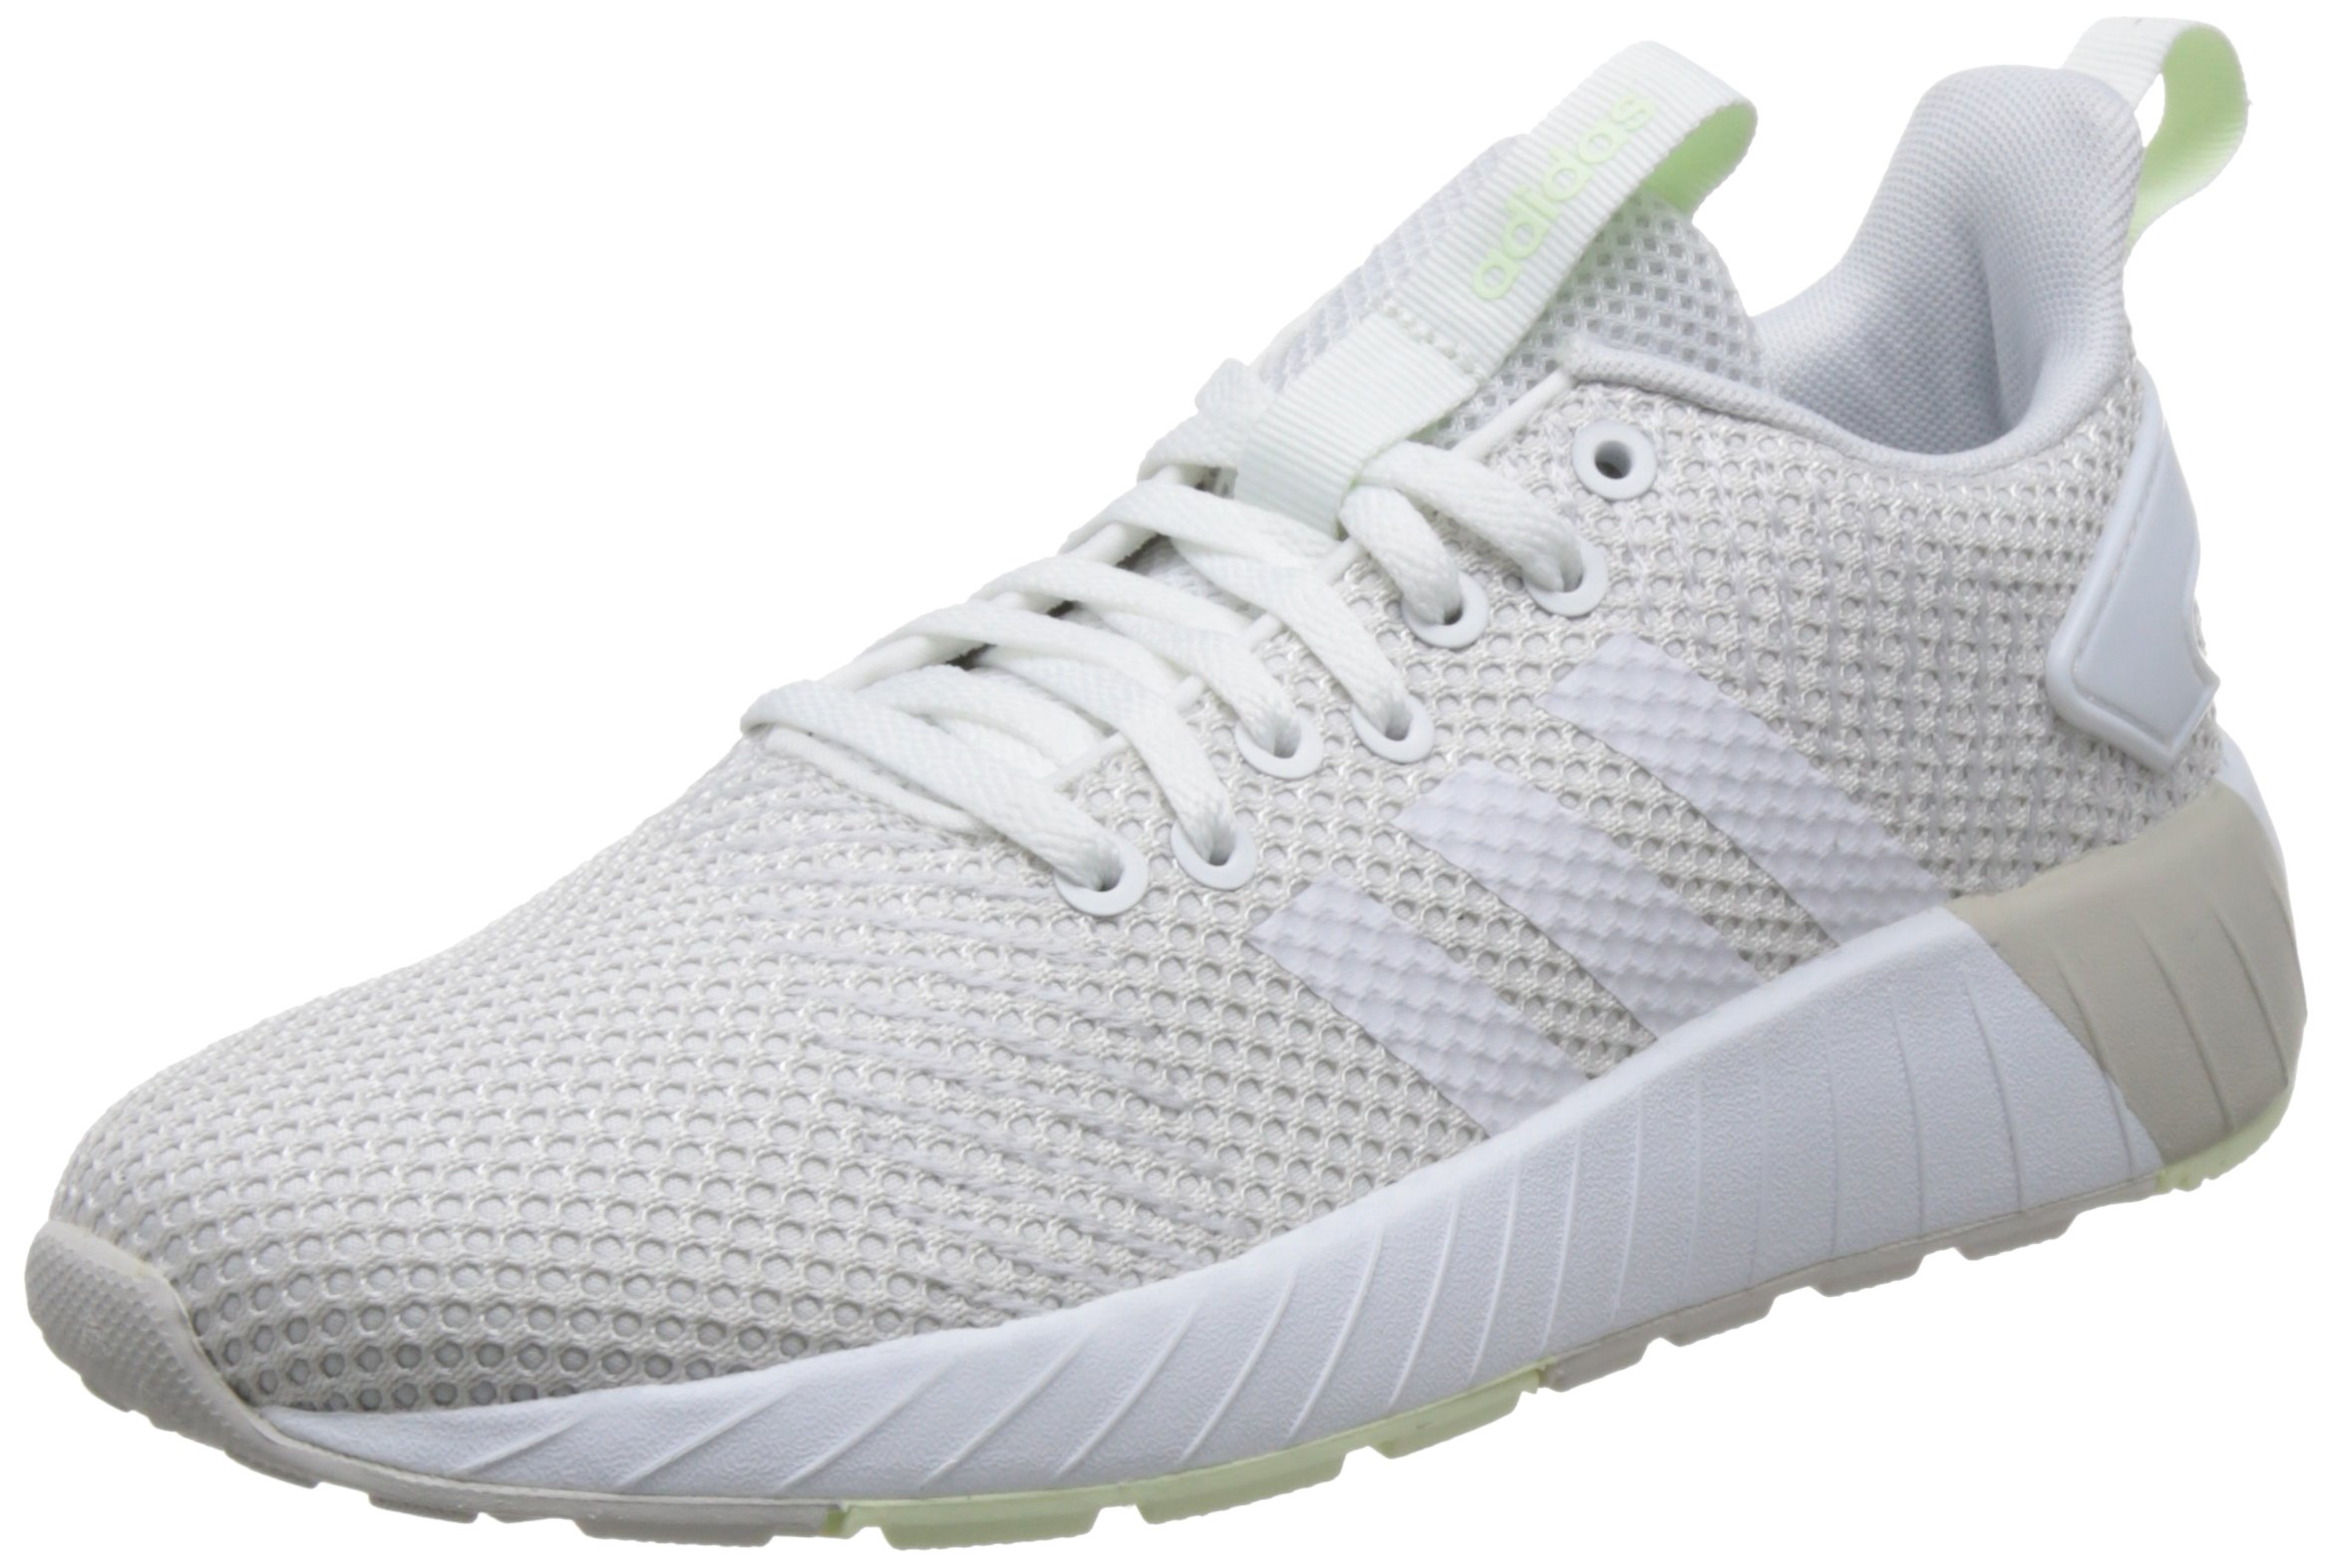 FemmeGrisgrey One 3 aero 1 footwear Basses Eu Questar White Adidas BydSneakers Green37 GqzVSUMp